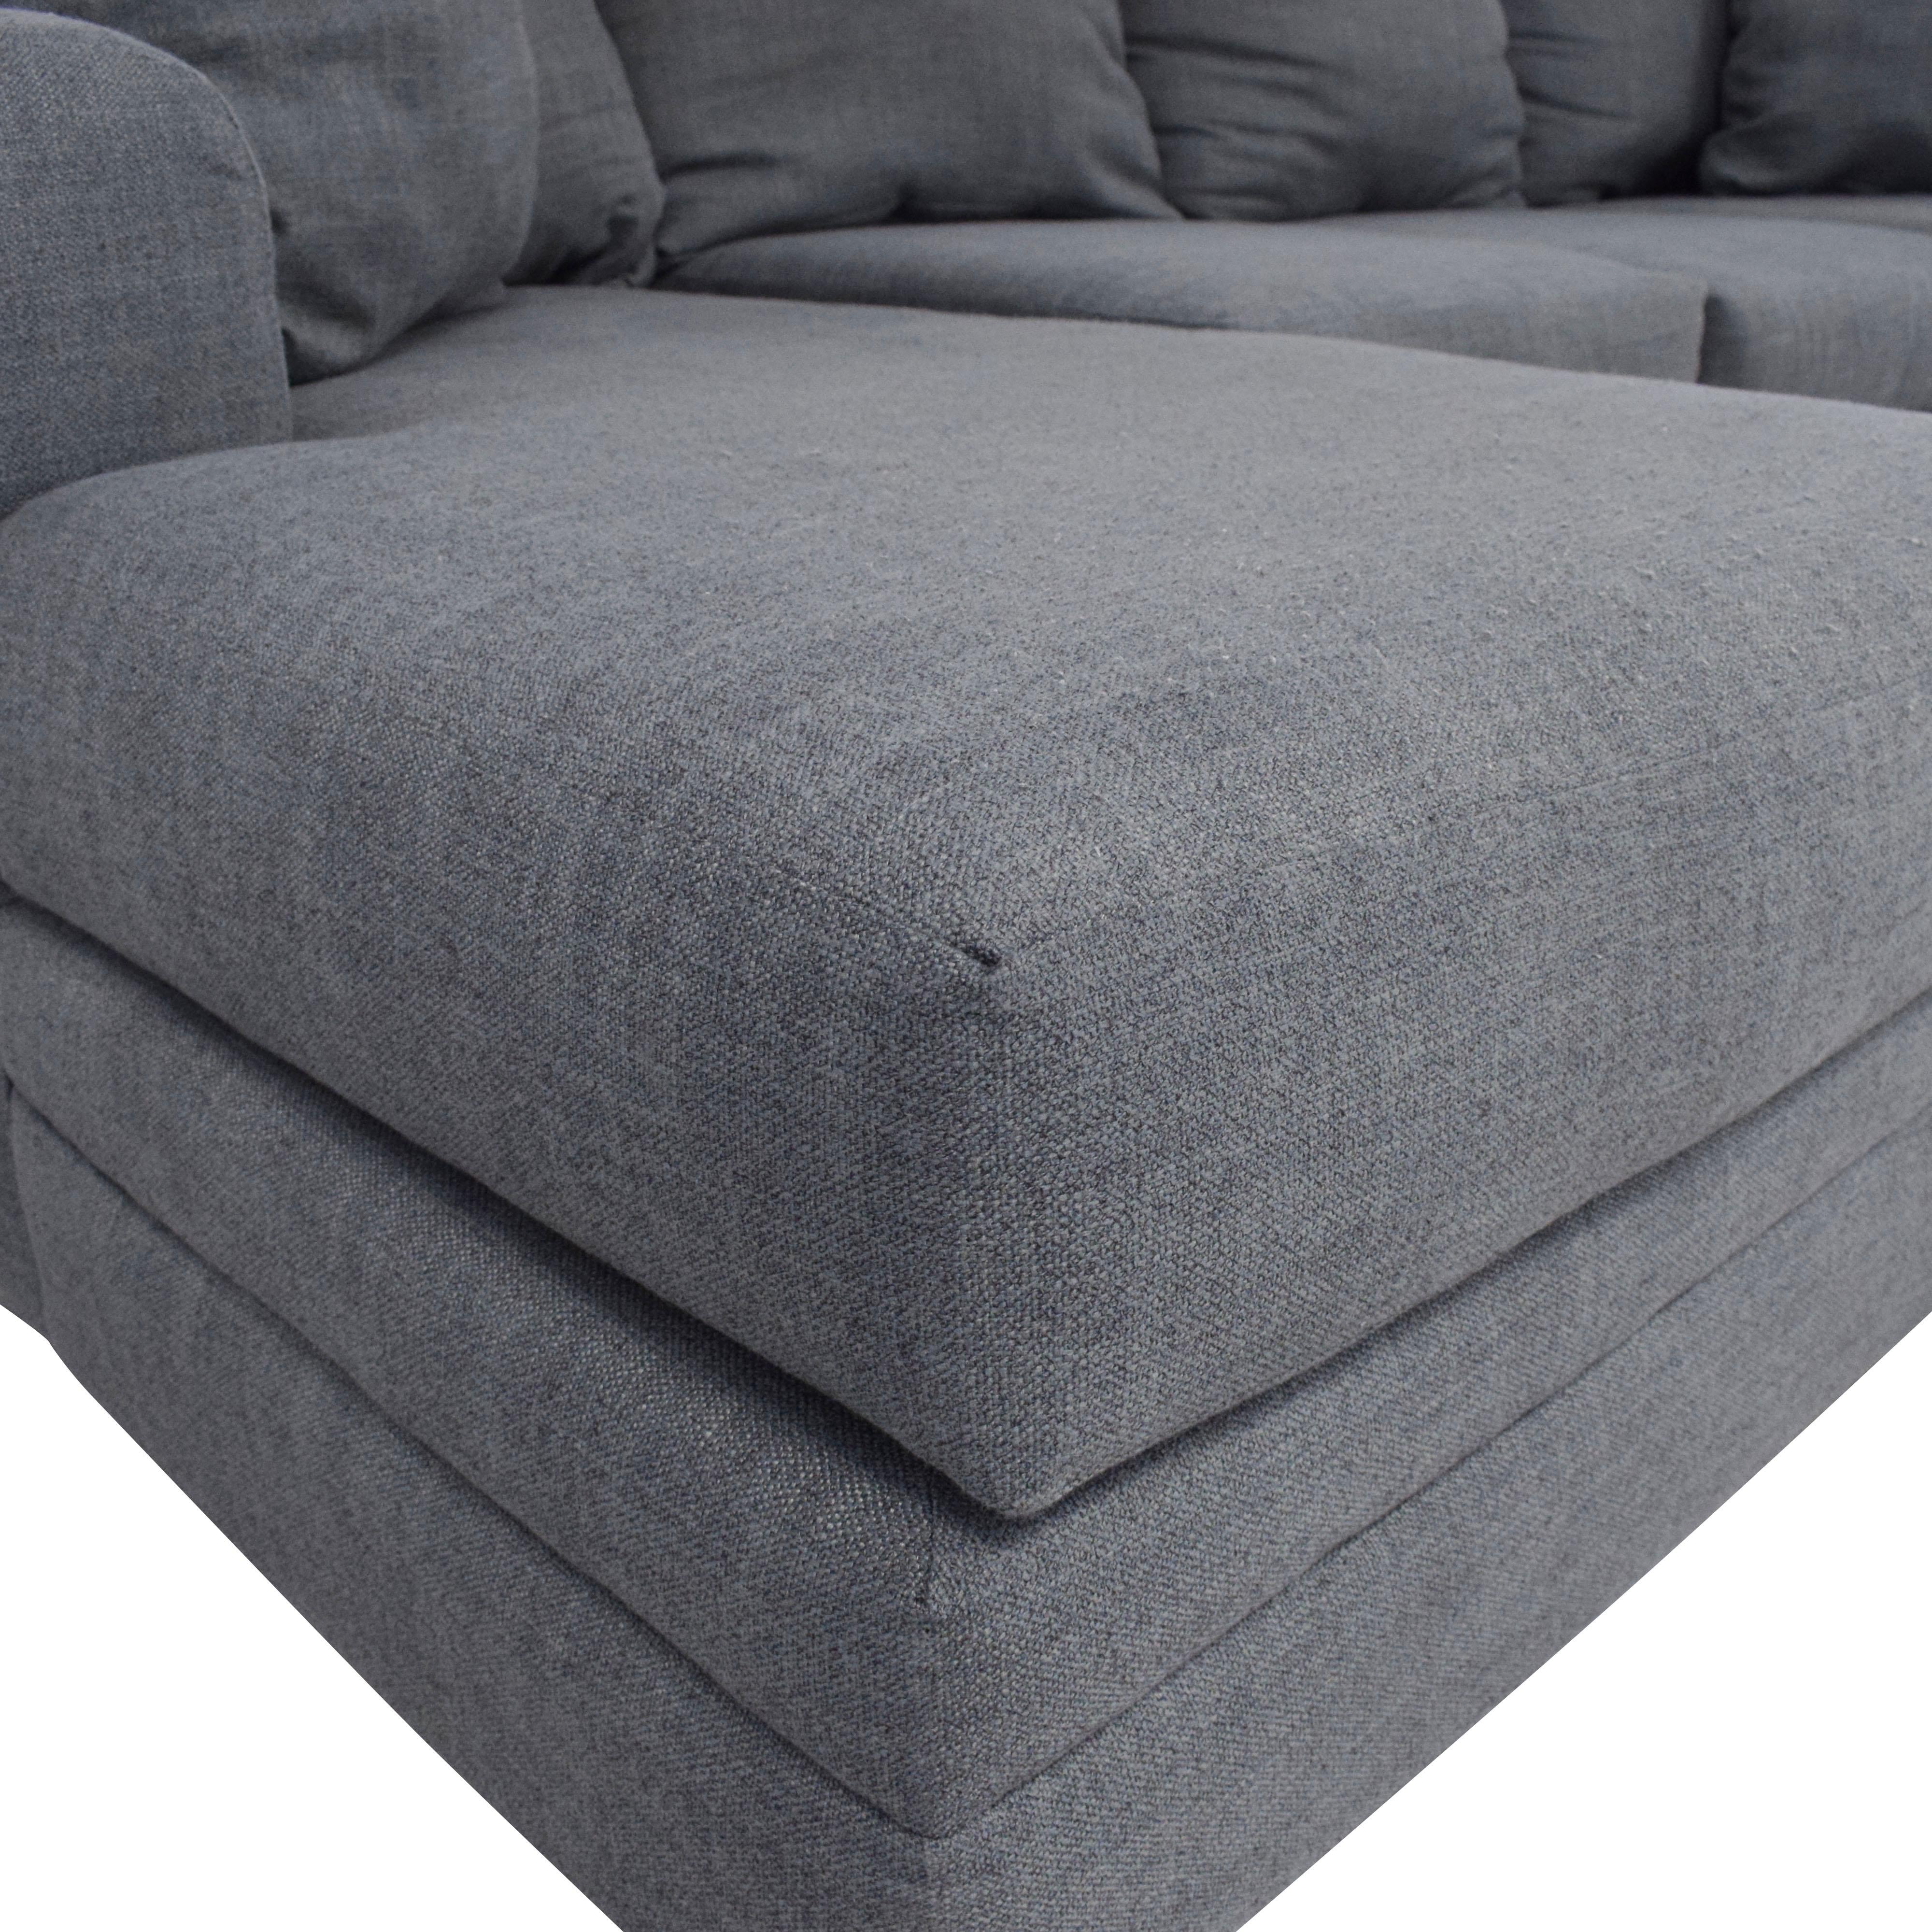 Birch Lane Gerrald Sectional Sofa sale